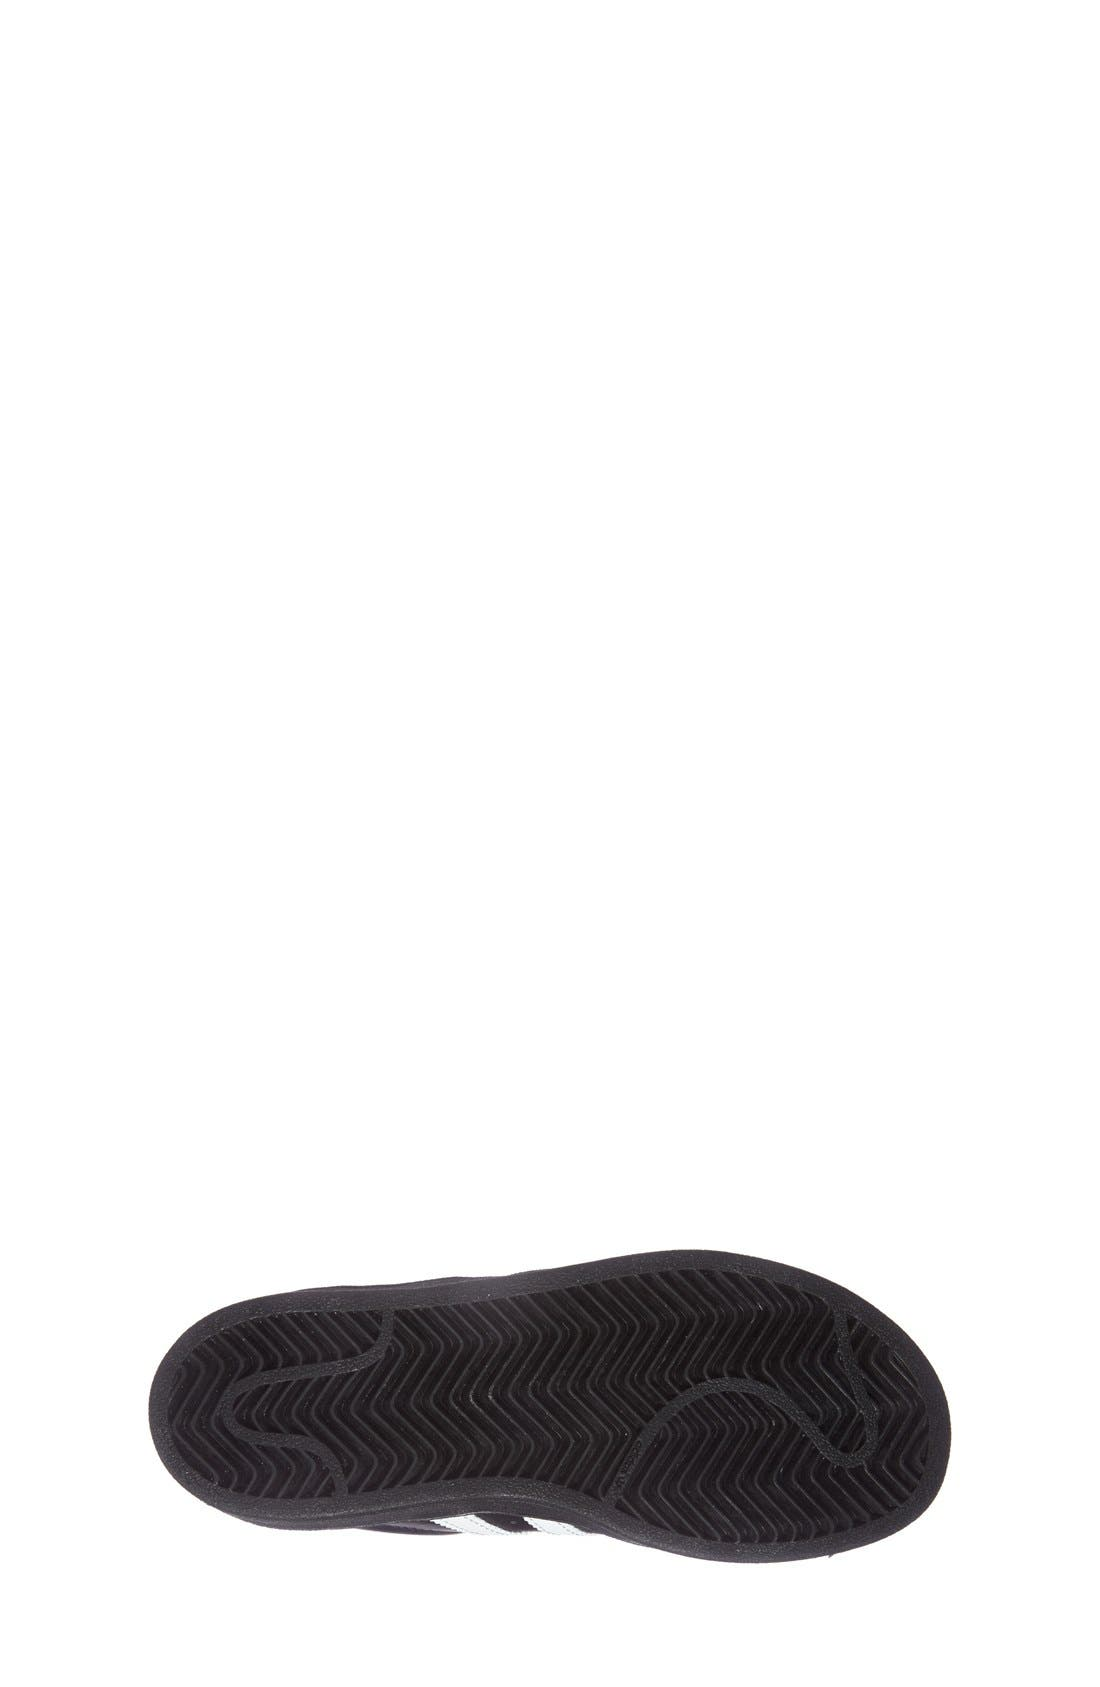 Alternate Image 2  - adidas 'Superstar' Sneaker (Baby, Walker, Toddler, Little Kid & Big Kid)